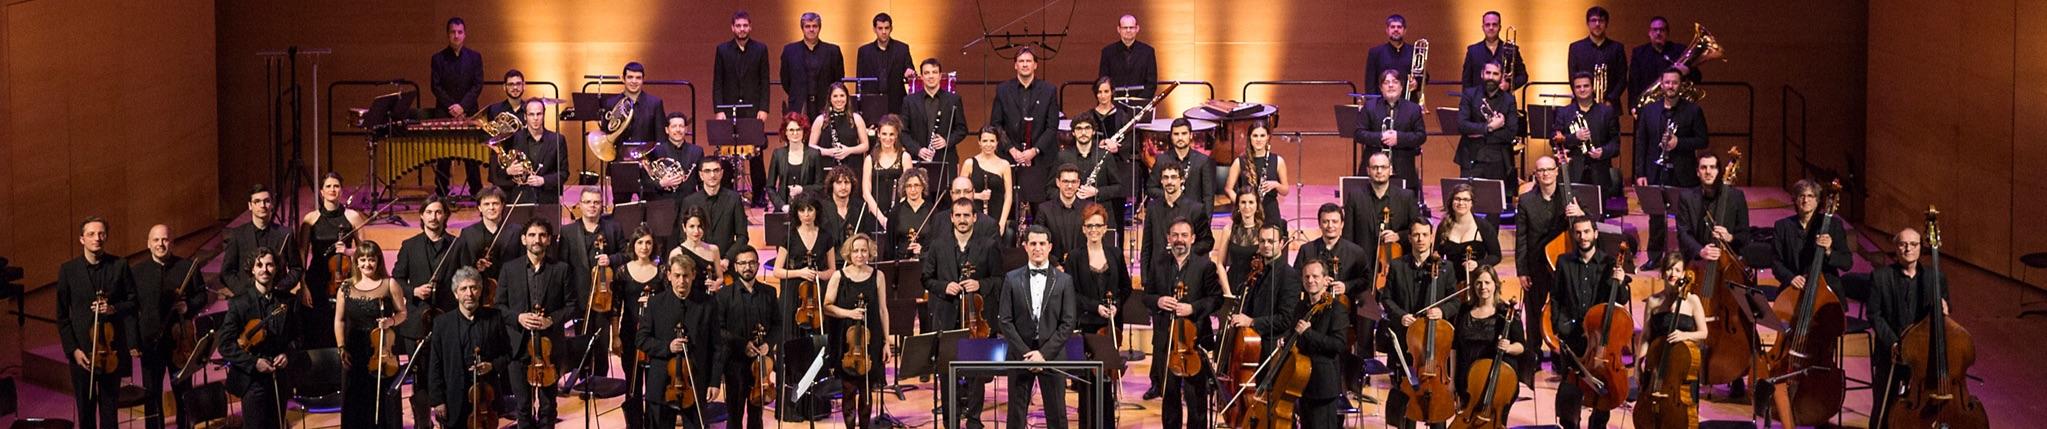 JENKINS - Palladio Concerto Grosso for strings 1er mov